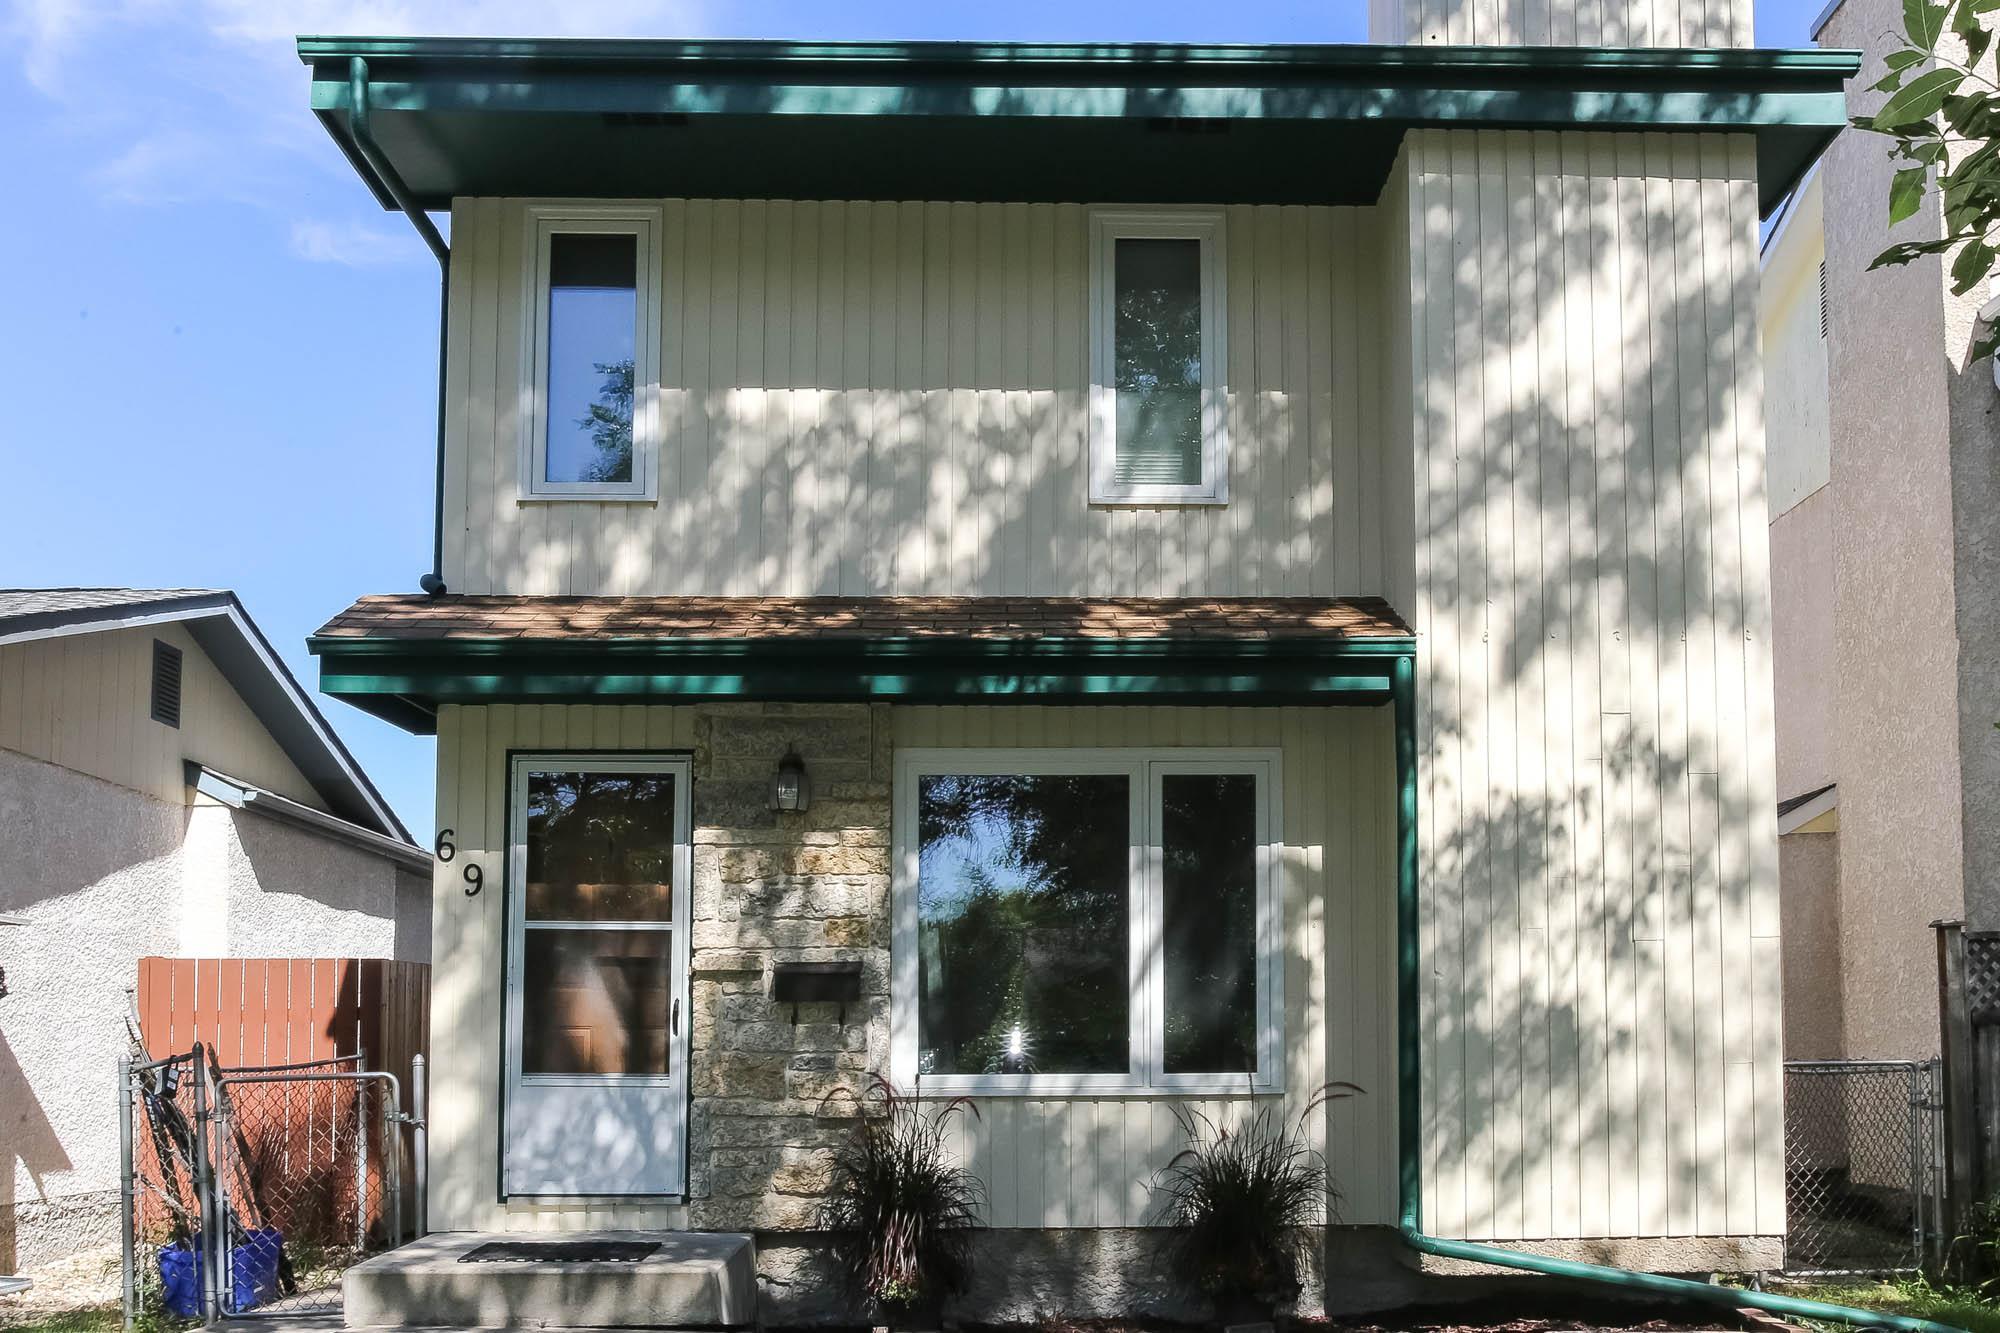 69 Carriage House Road, Winnipeg, Manitoba  R2N 2J5 - Photo 27 - 202020700